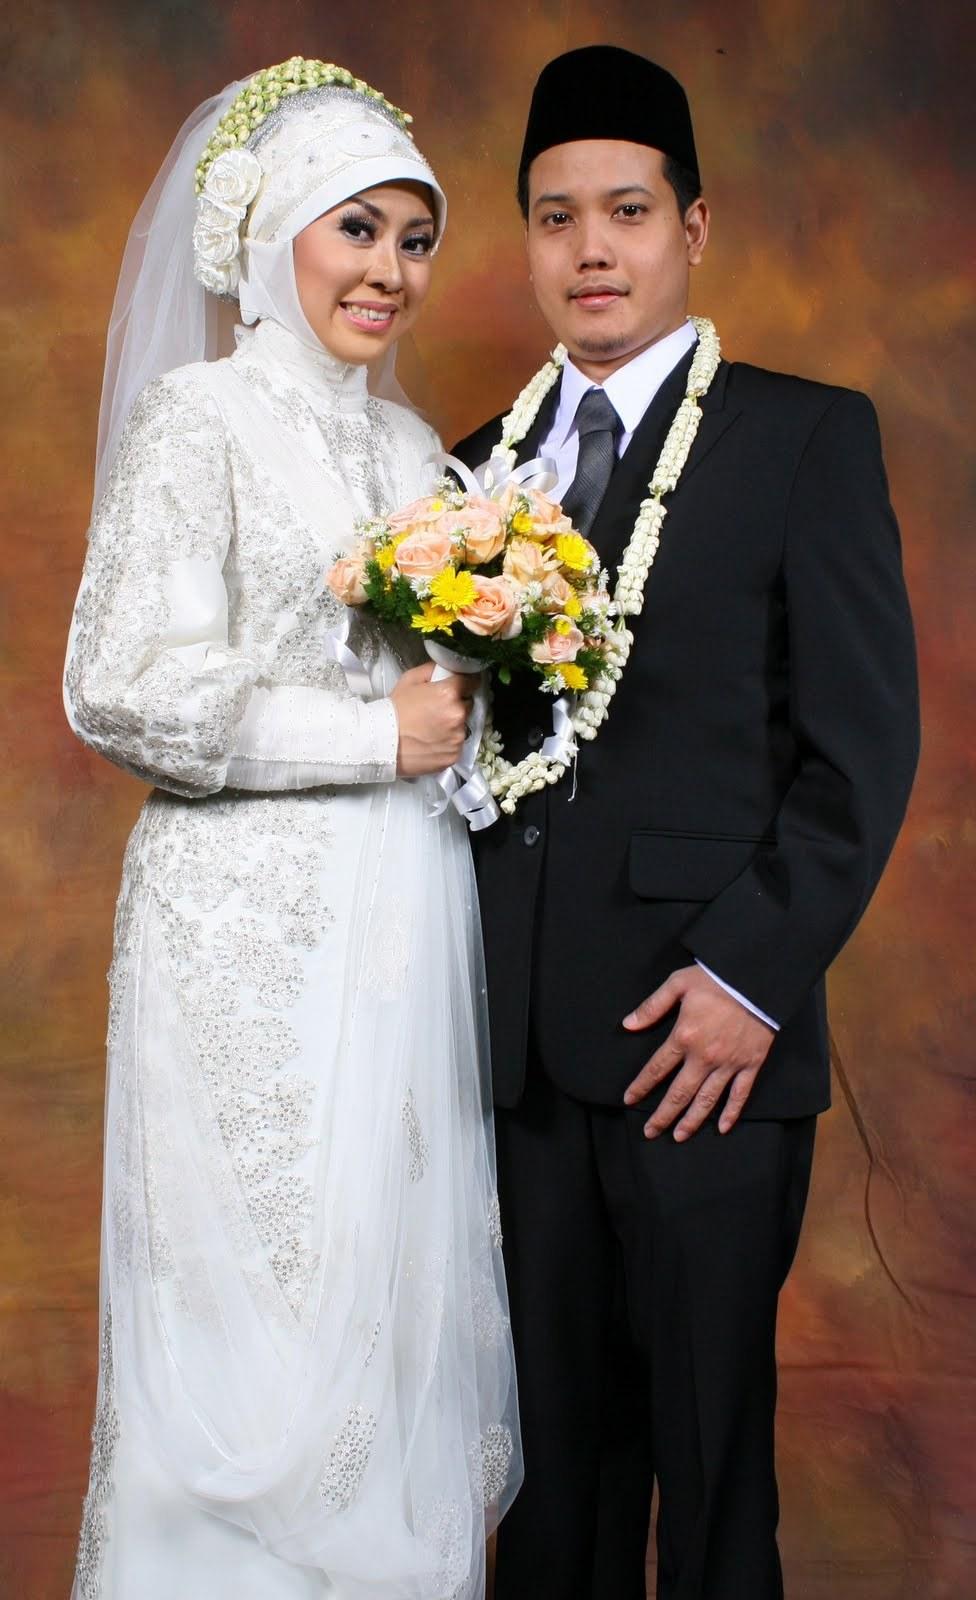 Bentuk Gaun Pernikahan Muslimah Syar'i Y7du Sewa Gaun Pernikahan Muslimah